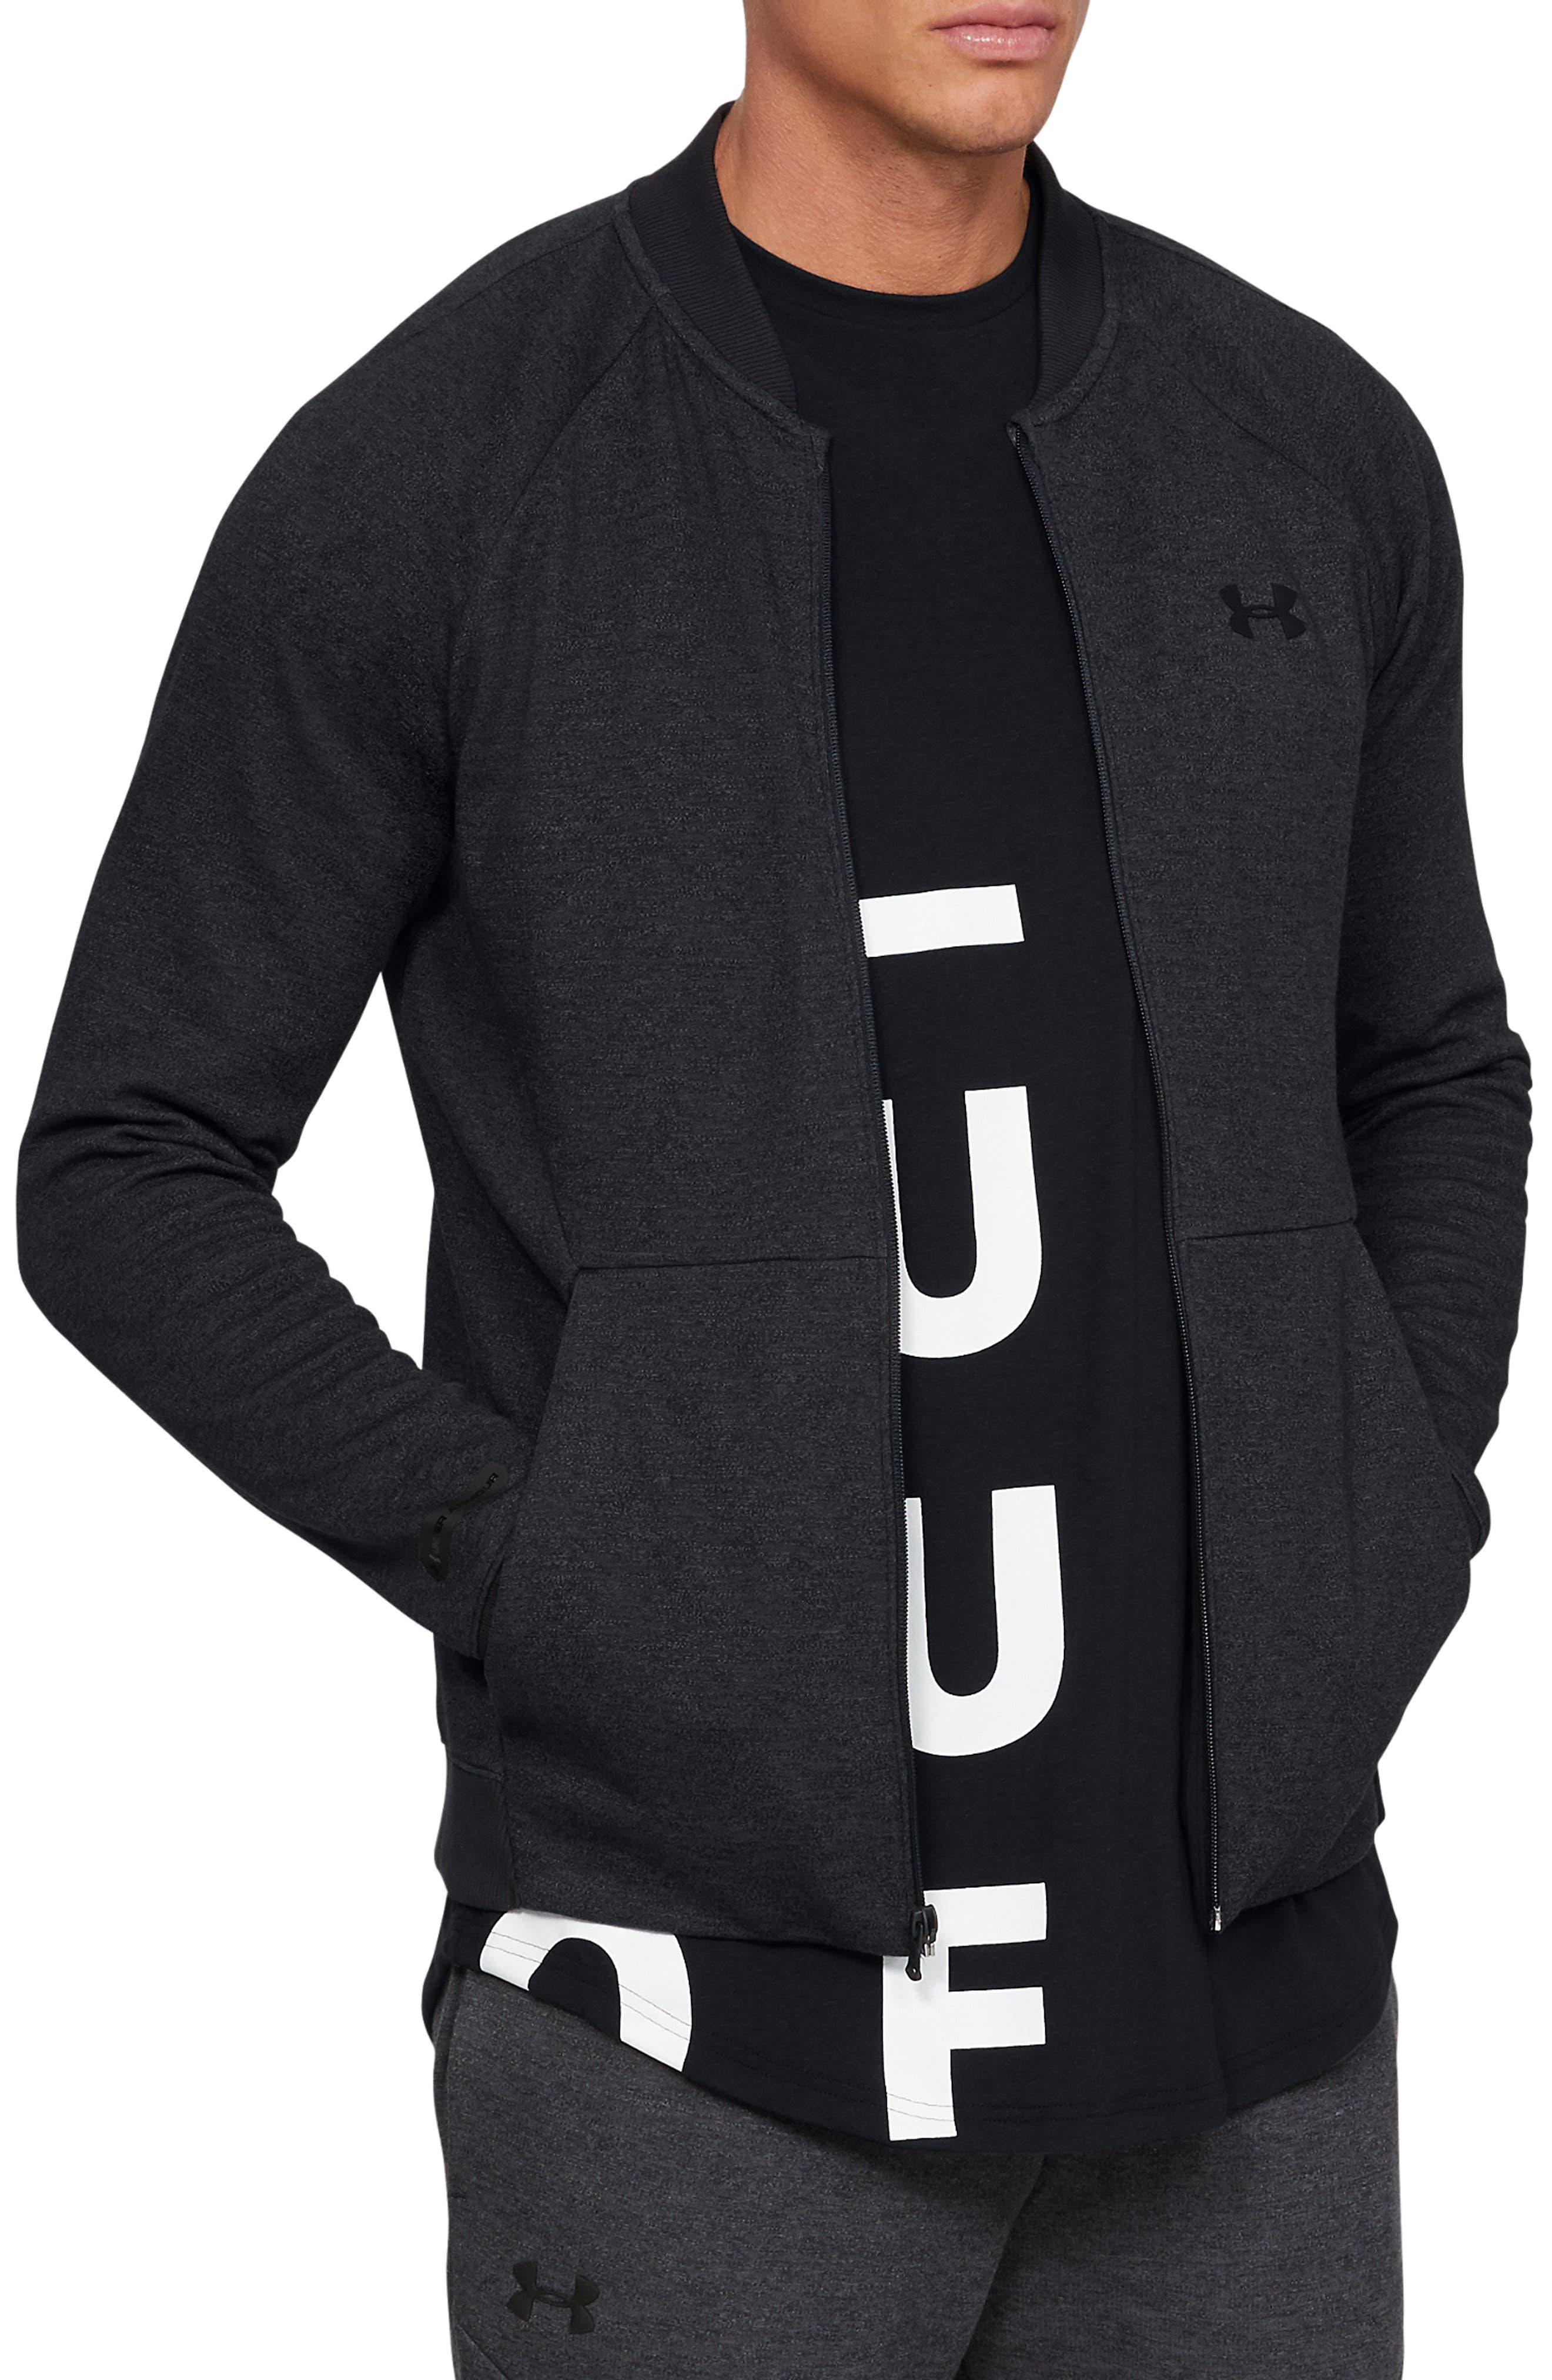 UNDER ARMOUR, Unstoppable Double Knit Bomber Jacket, Main thumbnail 1, color, BLACK/ BLACK/ BLACK